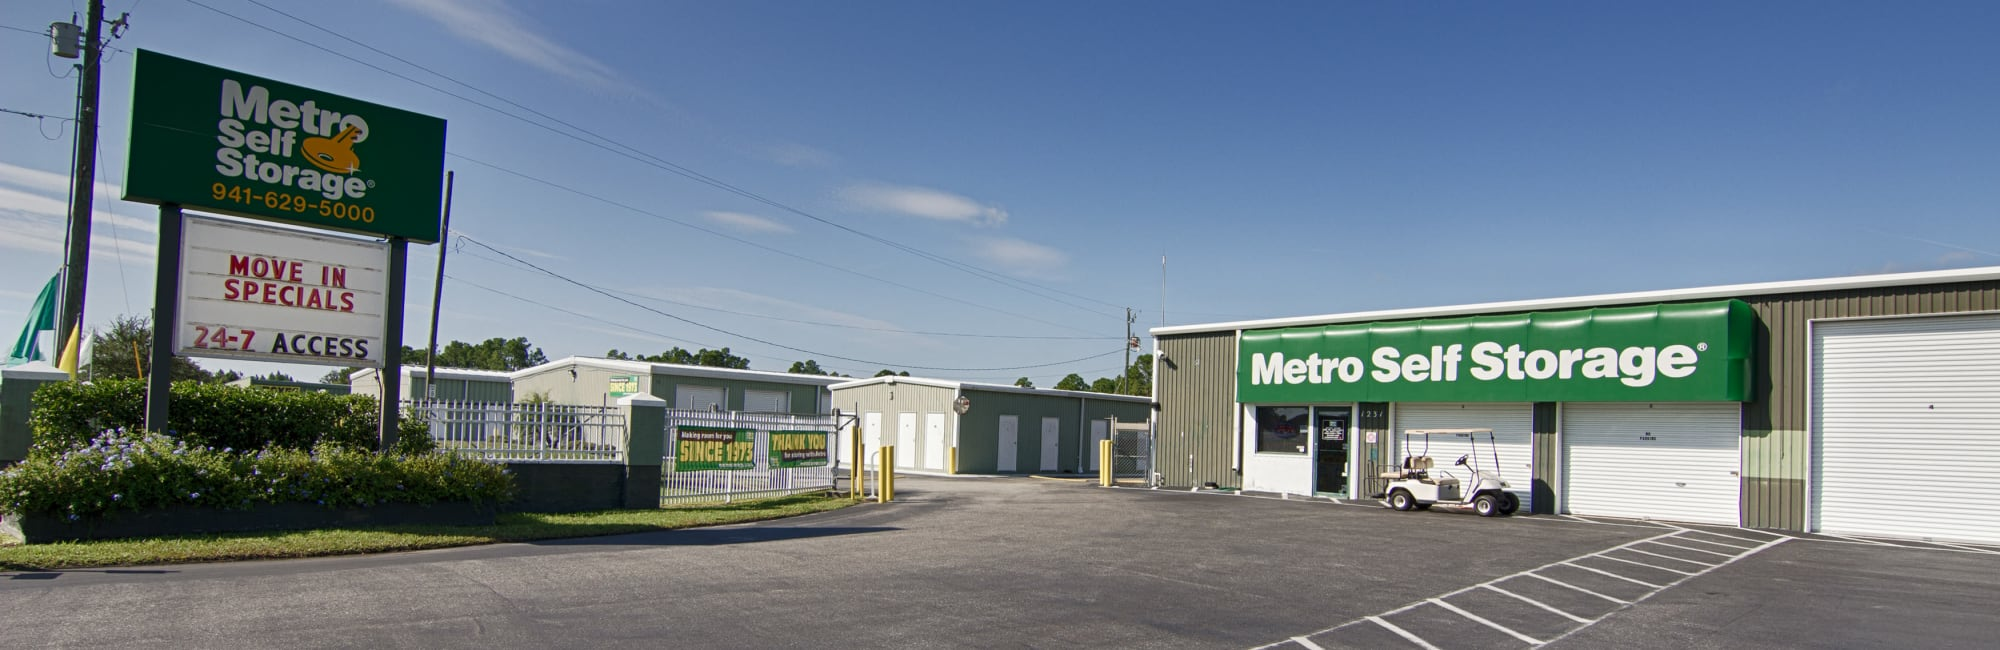 Metro Self Storage in Port Charlotte, FL